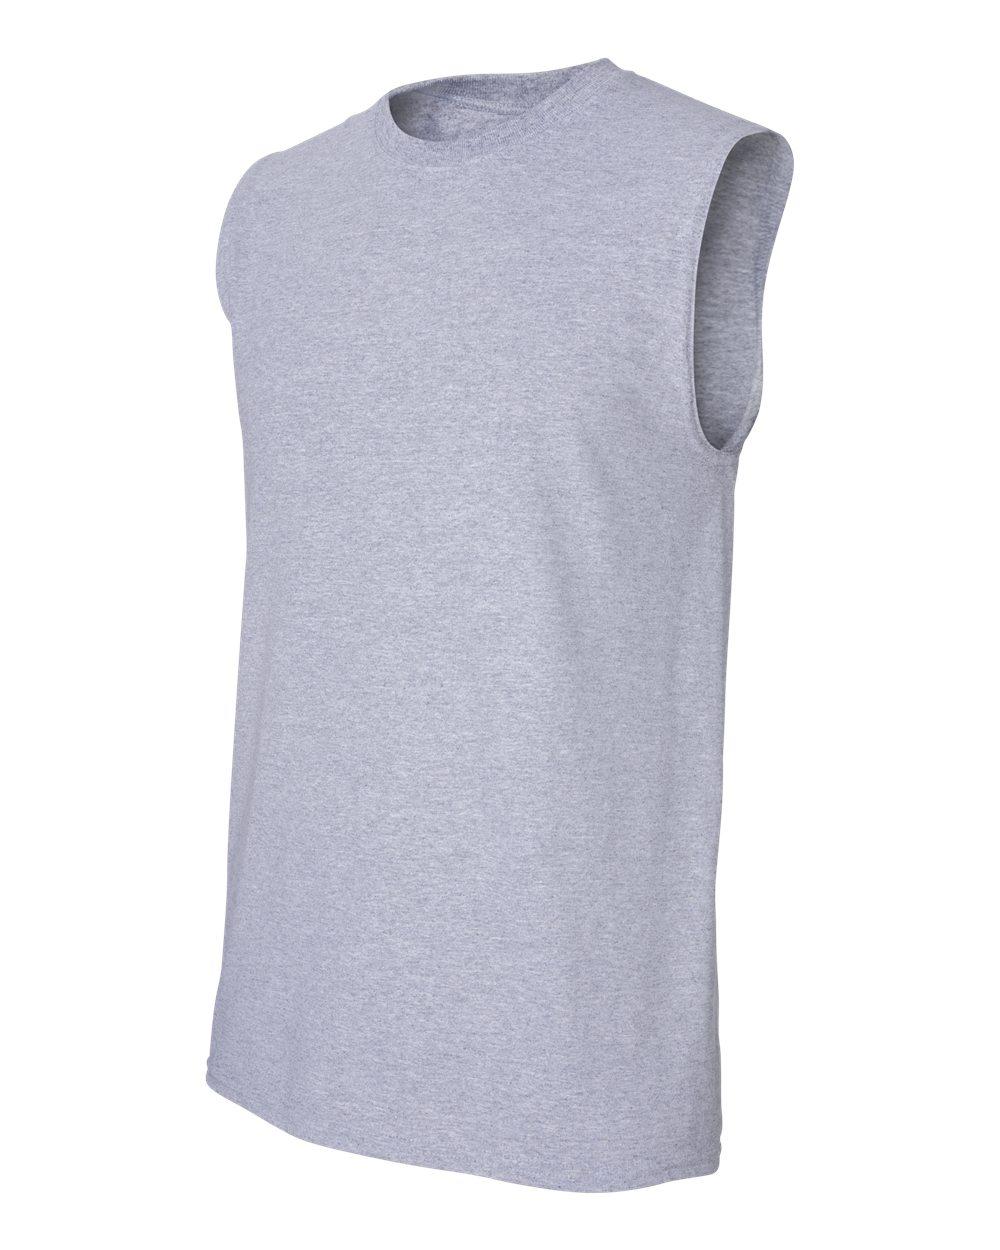 06d22c3ab7ec Gildan 2700 - Ultra Cotton Sleeveless T-Shirt - Friendly Arctic Printing